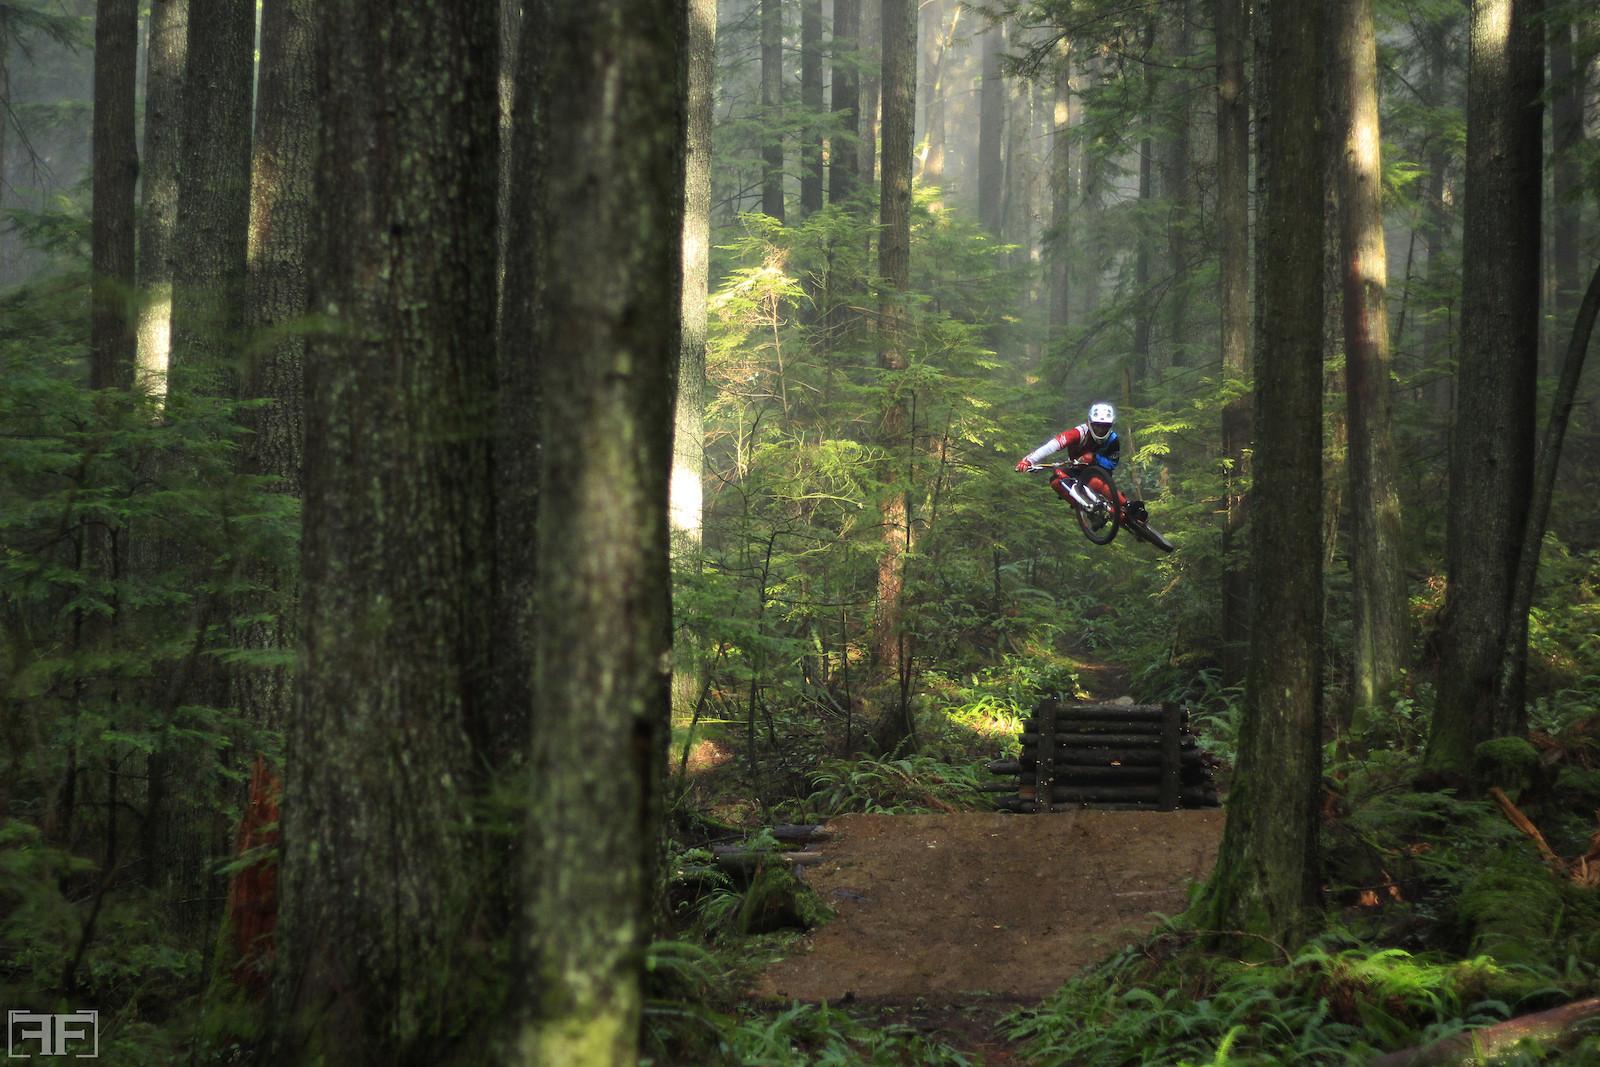 MIsty step down - brygreg - Mountain Biking Pictures - Vital MTB